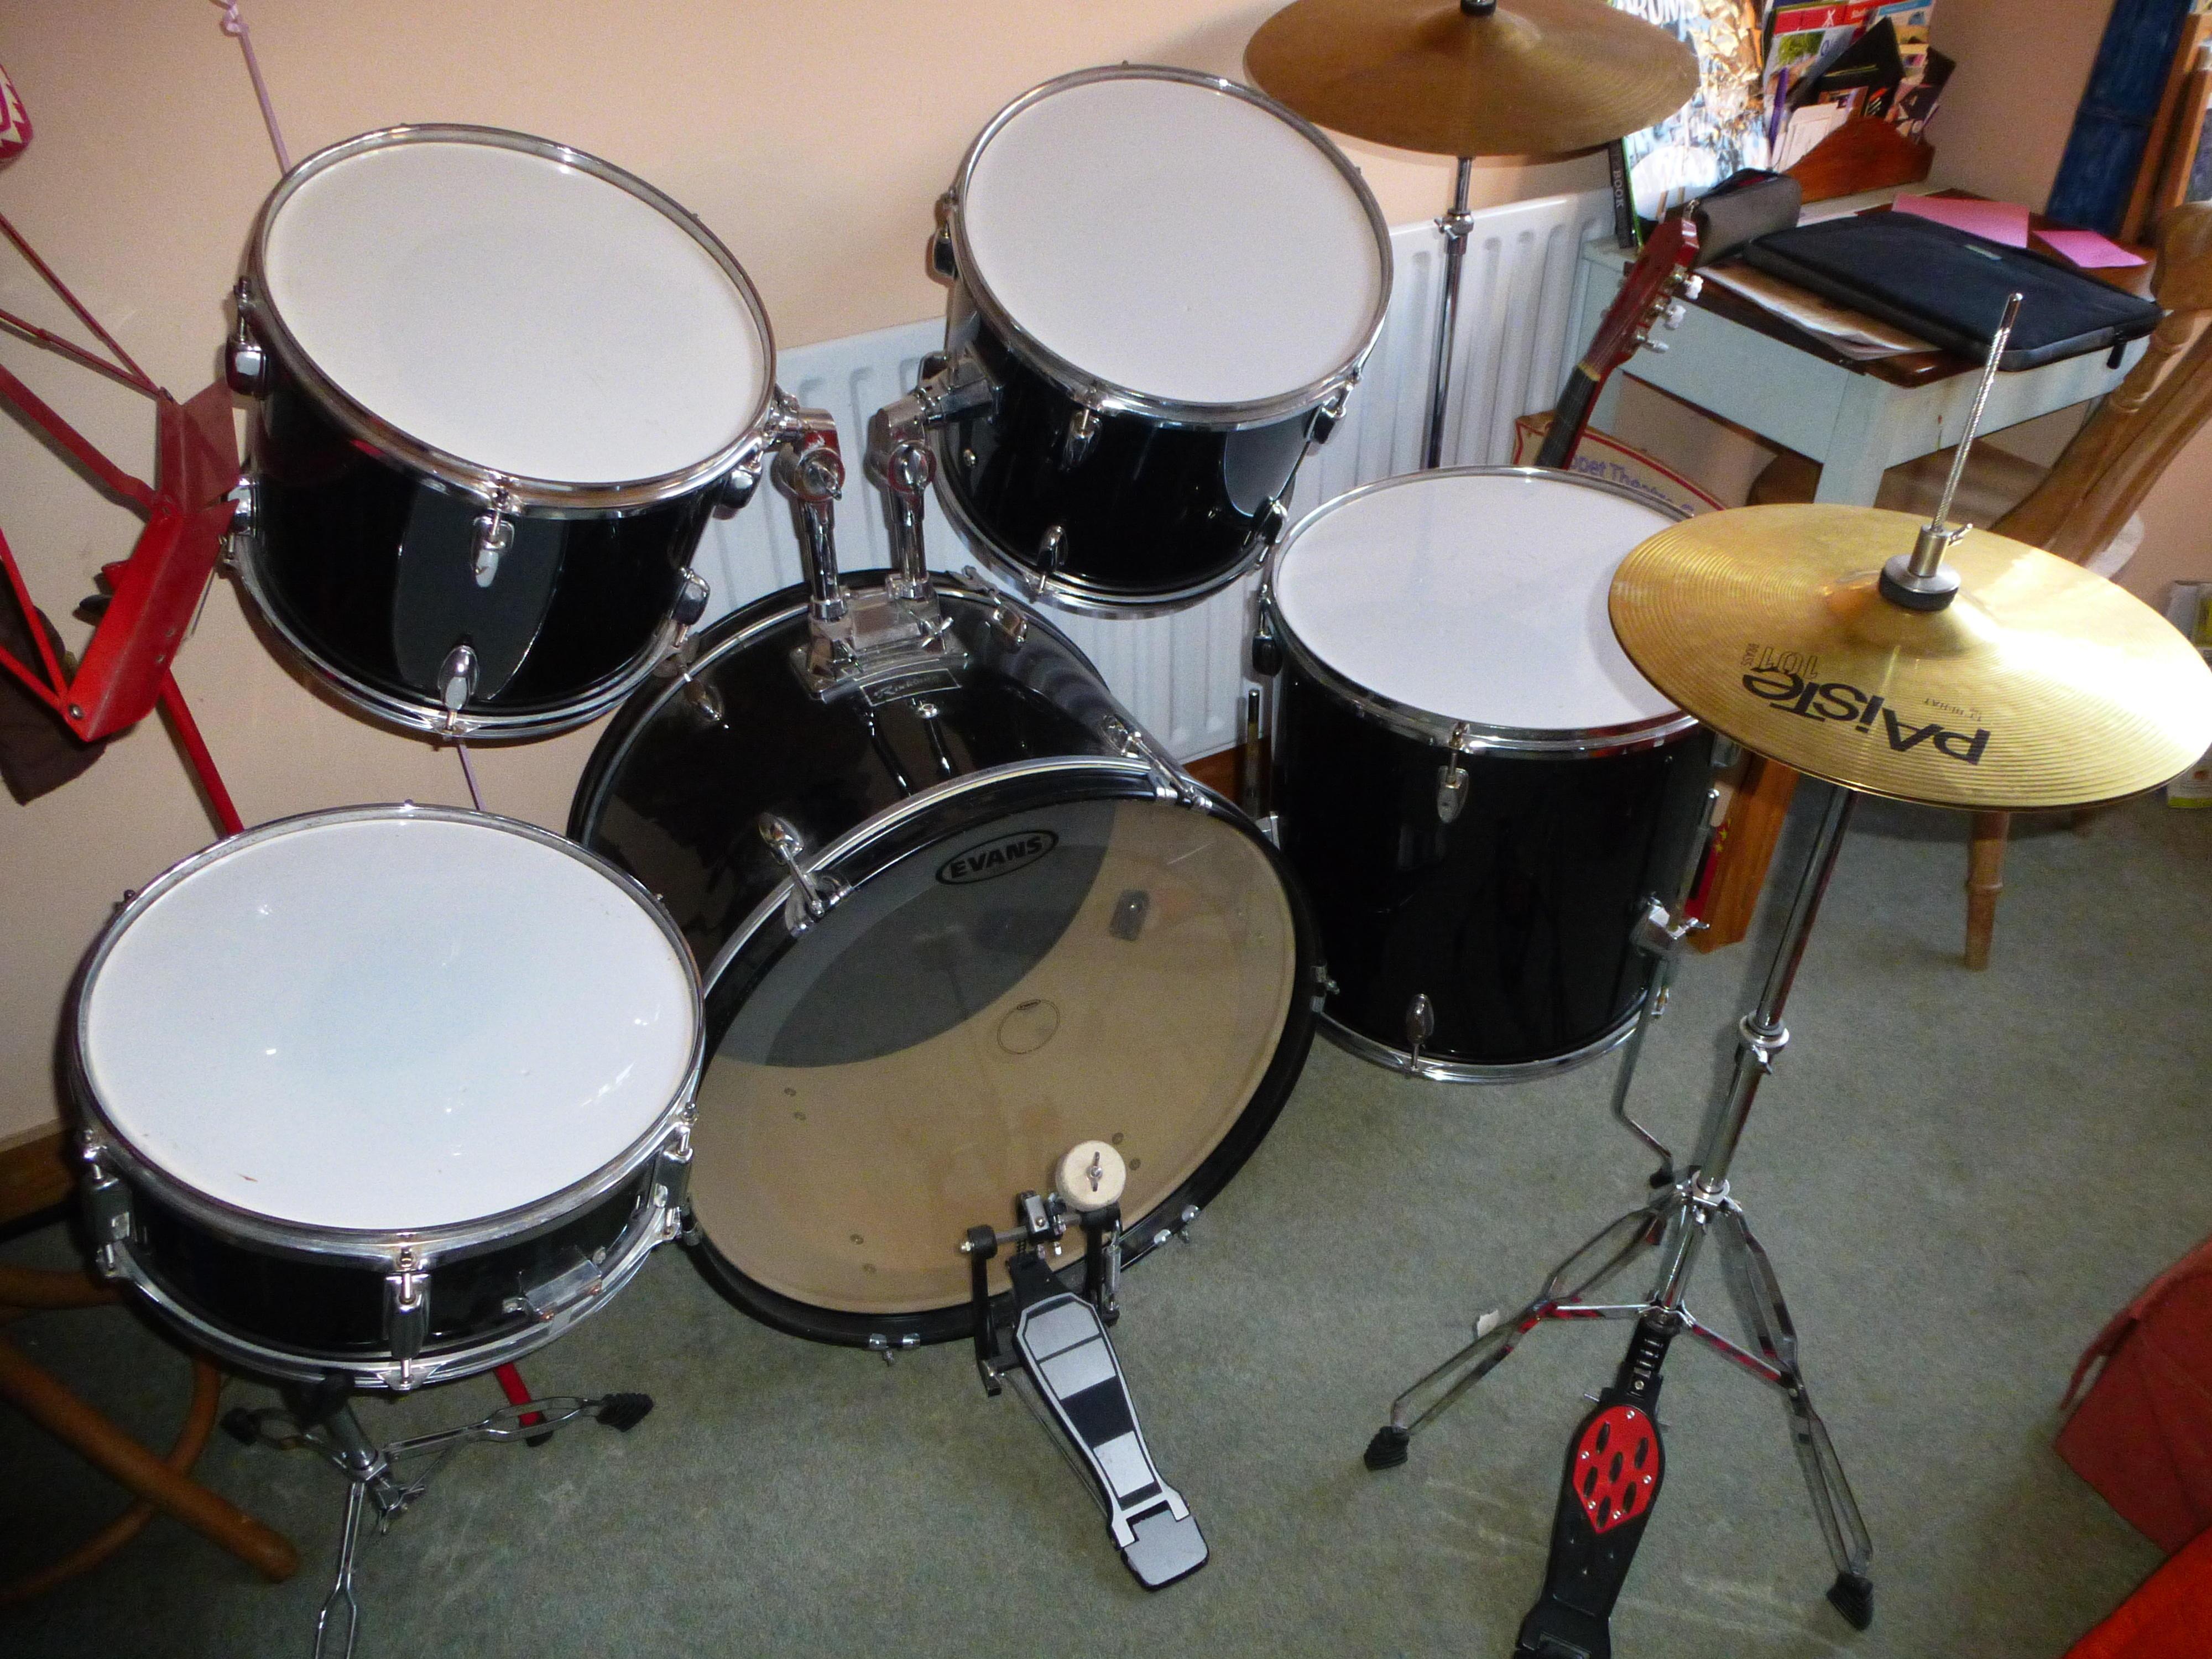 Full drum kit by Rockburn